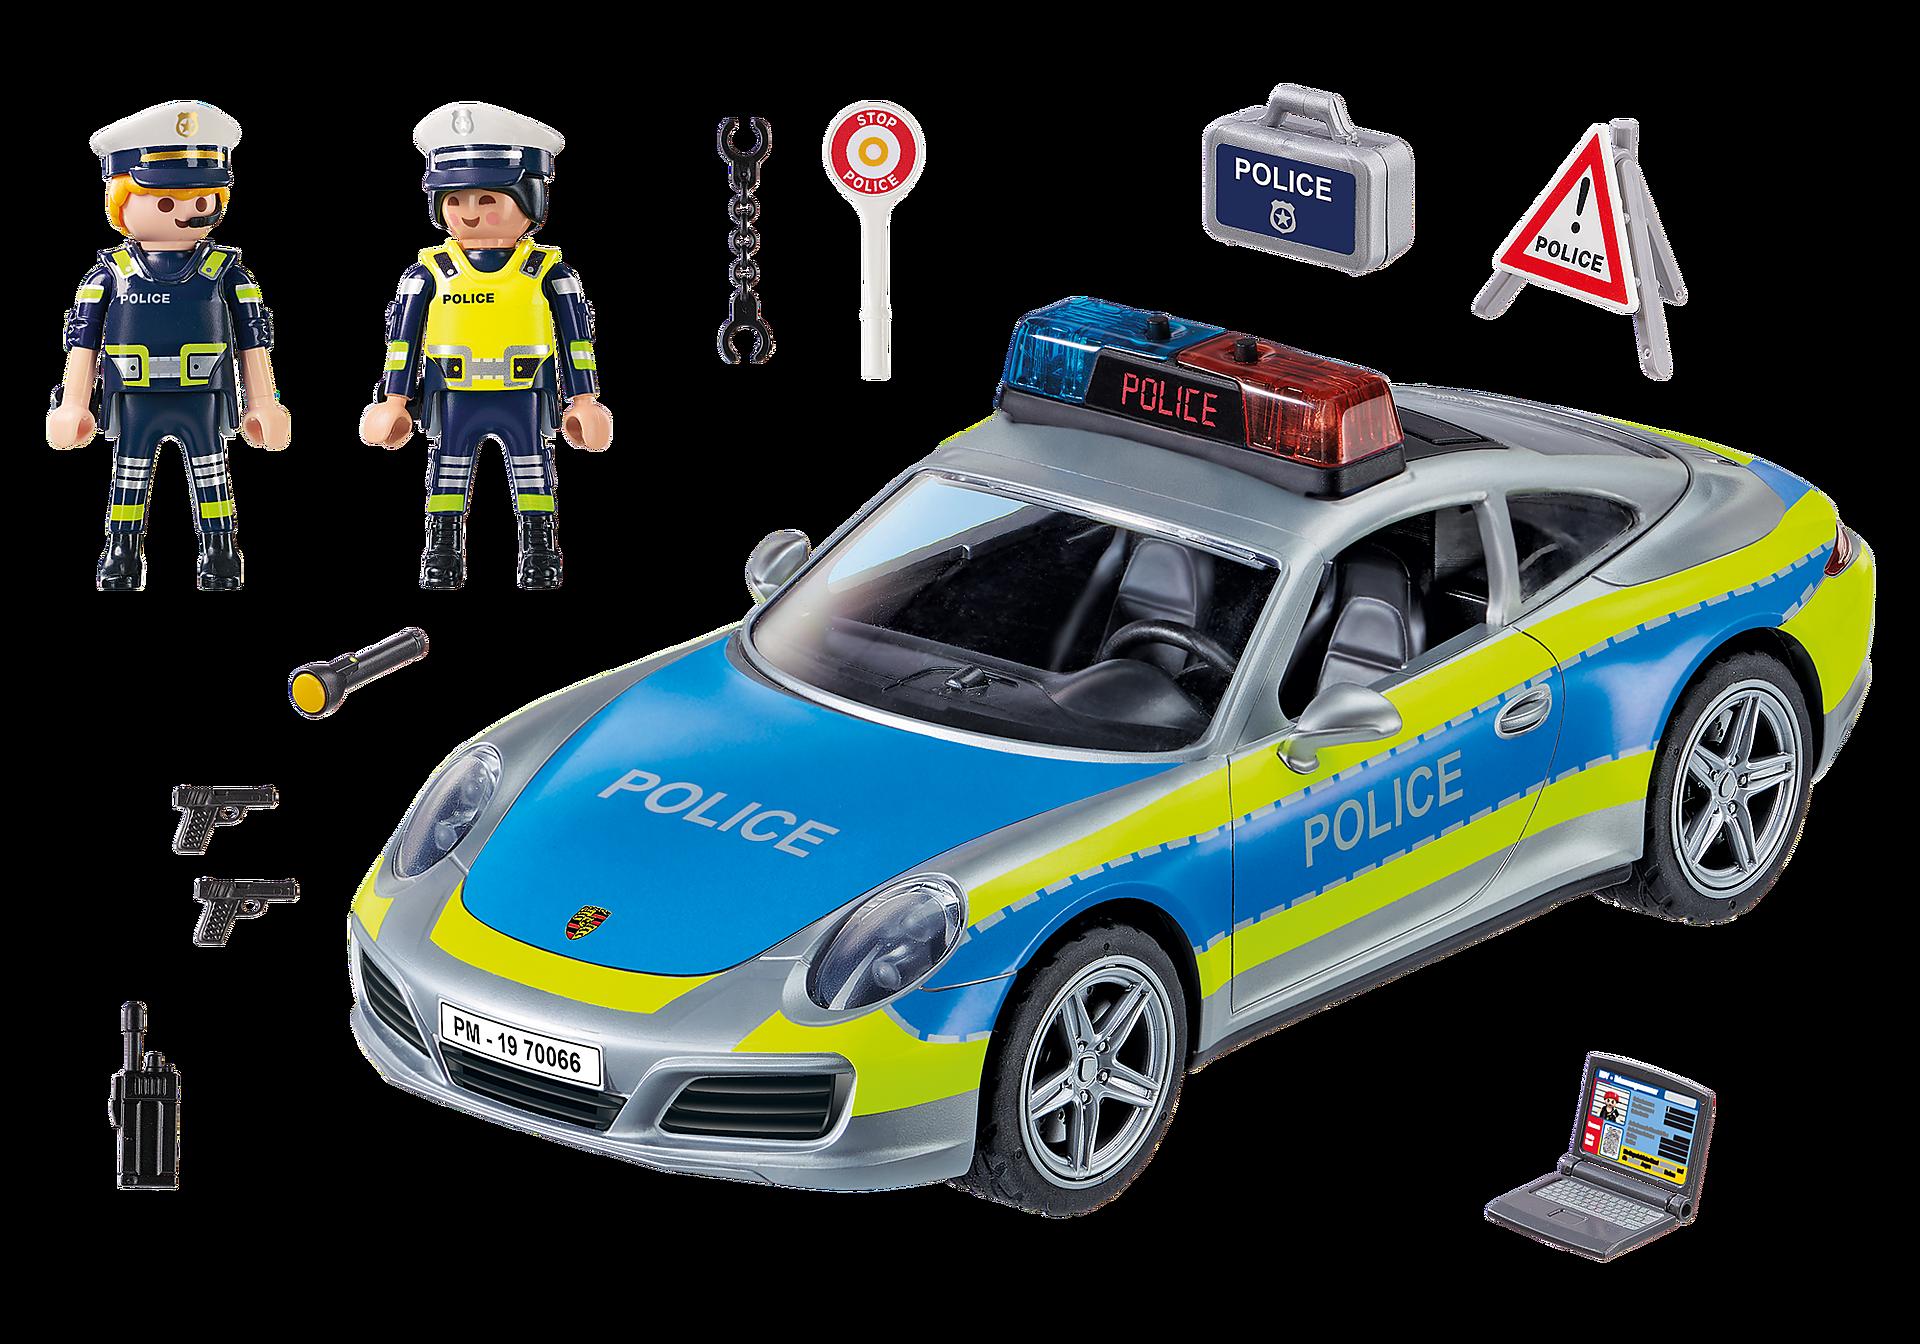 70066 Porsche 911 Carrera 4S Police  zoom image3